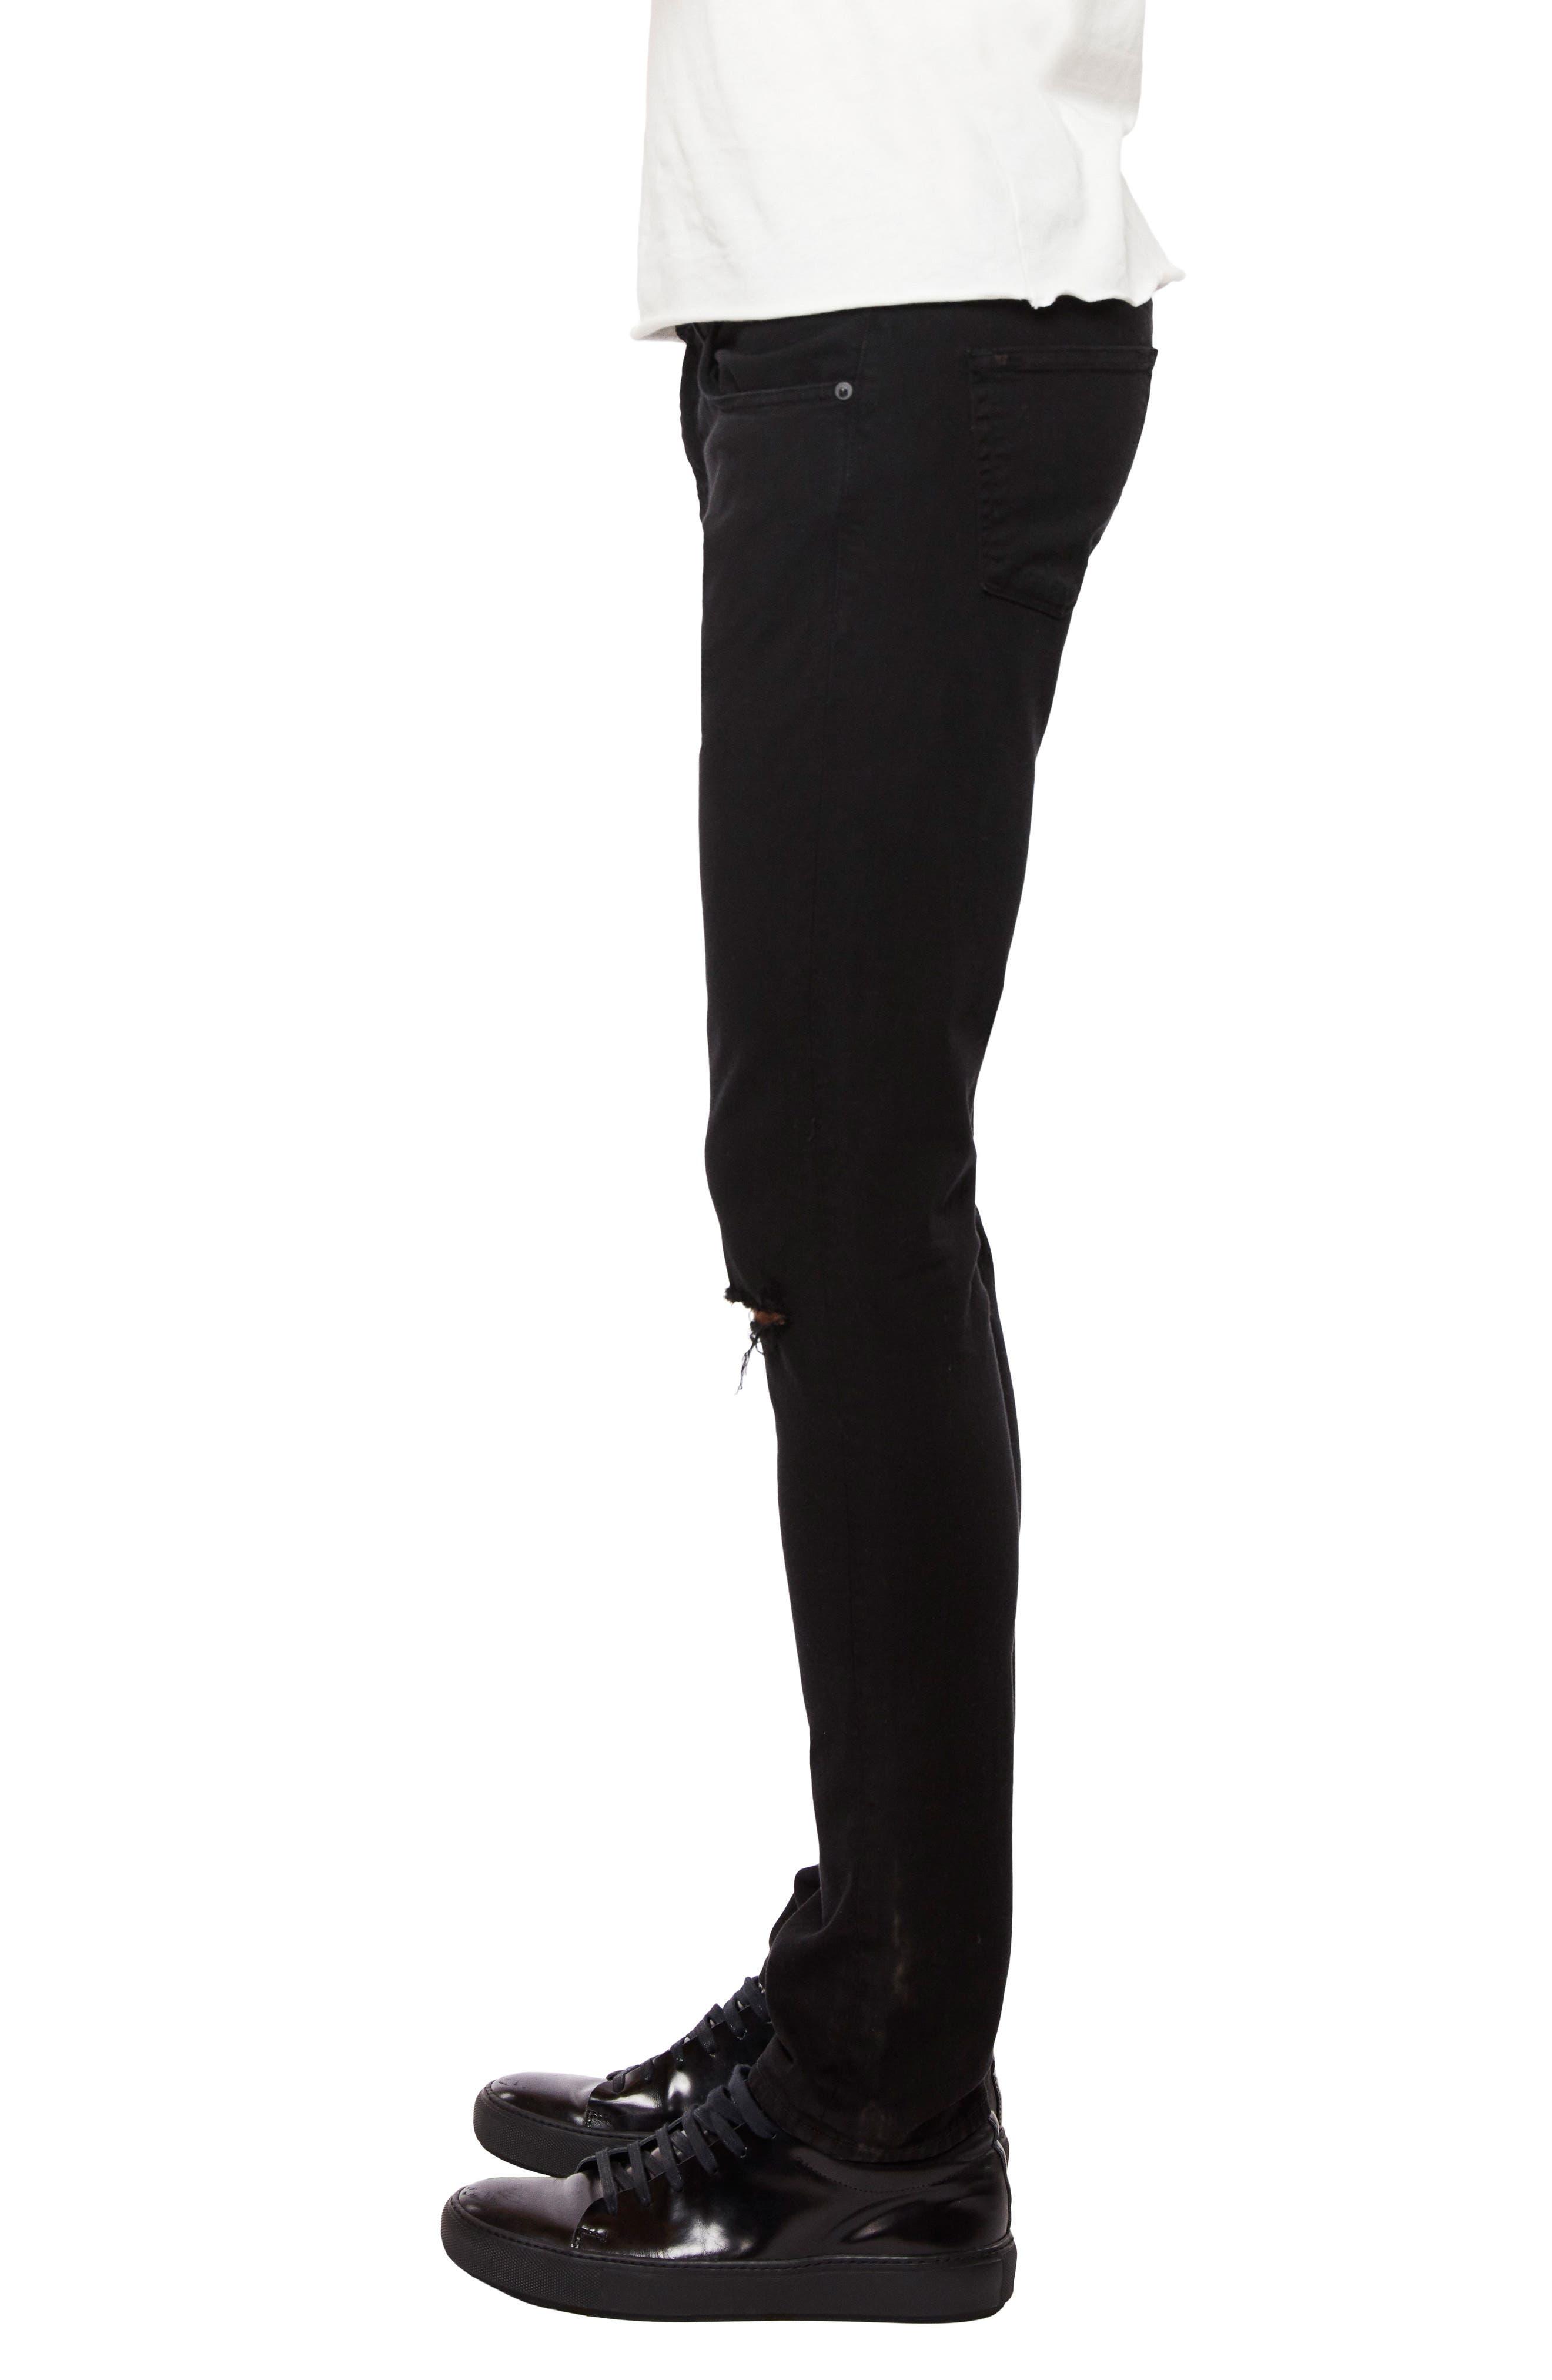 Mick Skinny Fit Jeans,                             Alternate thumbnail 3, color,                             001